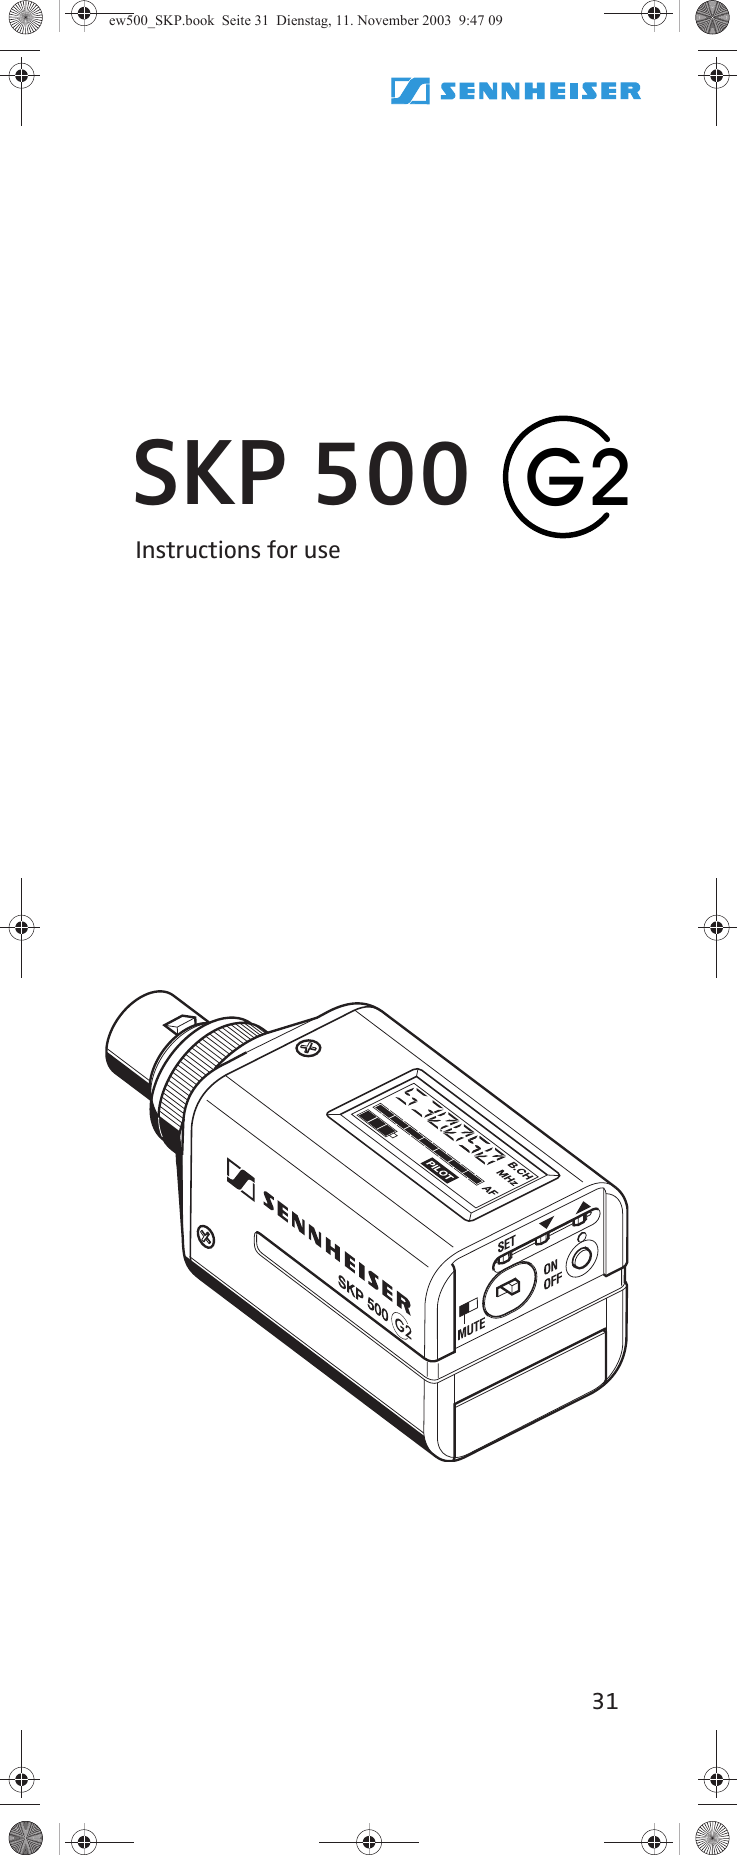 g2 phone manual